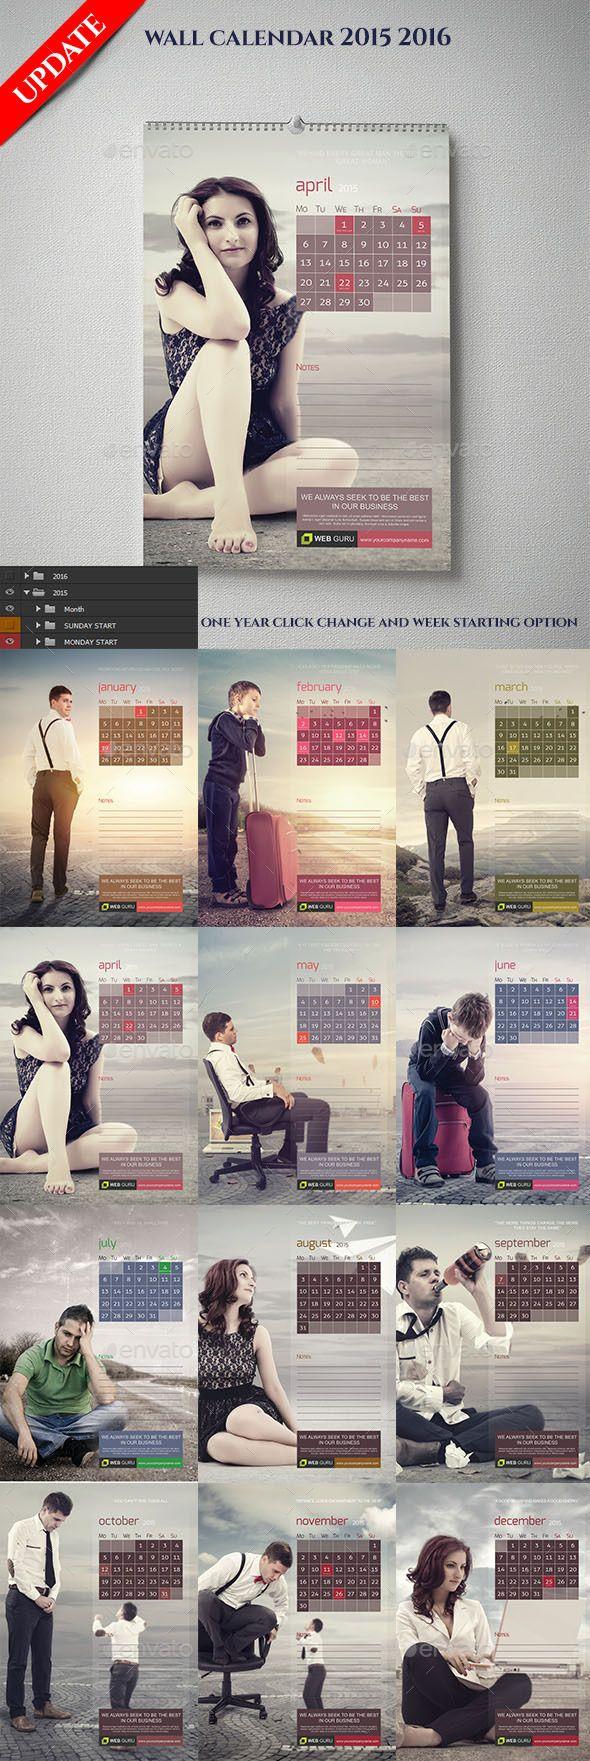 Wall Calendar 2015 And 2016 - Calendars Stationery